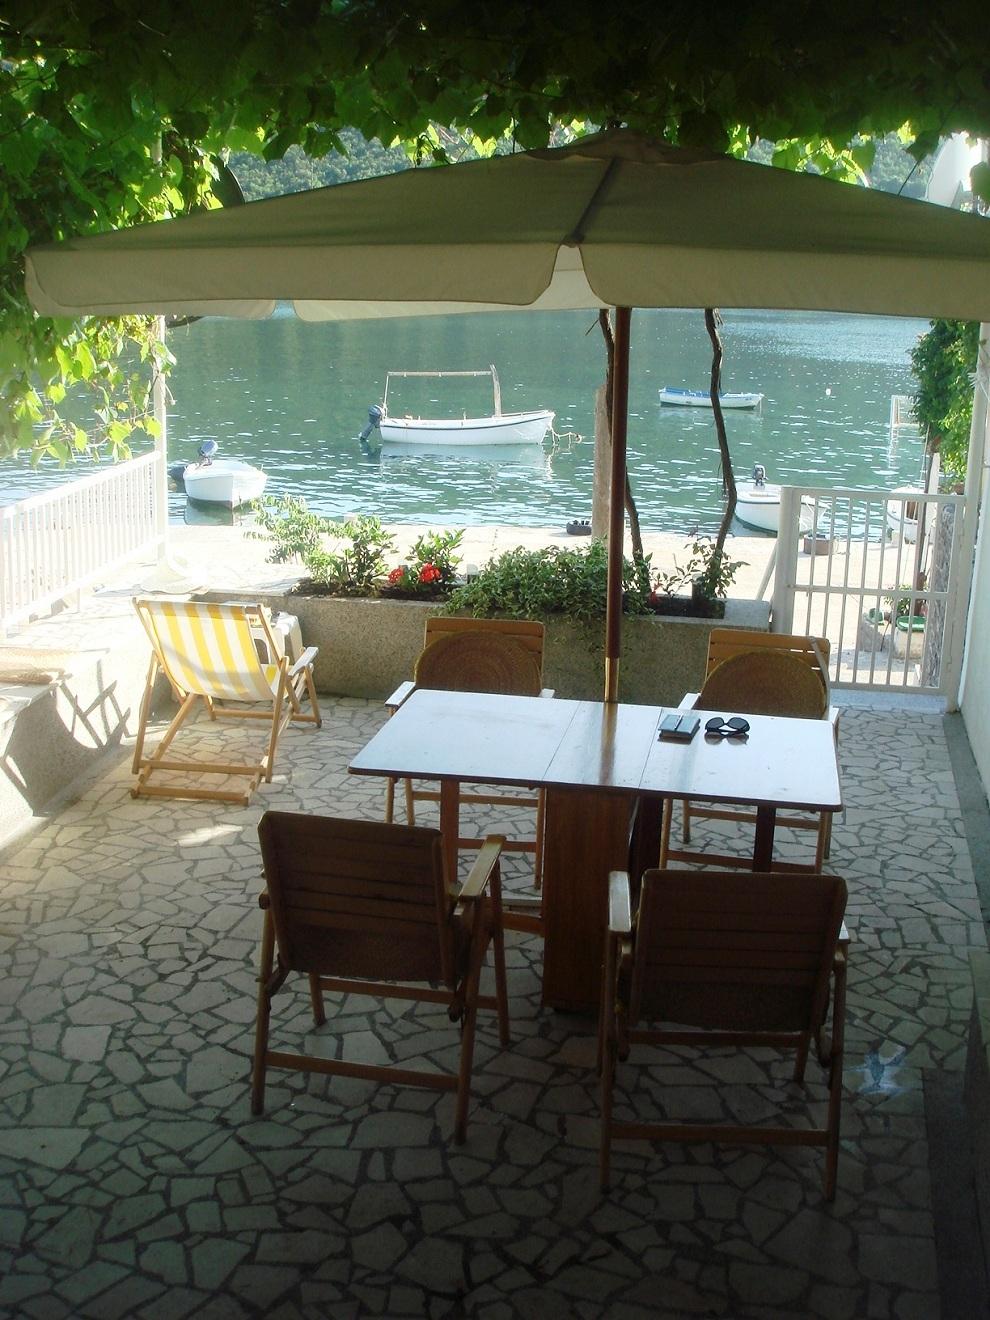 house for sale in bigovo montenegro maison traditionnelle en 224 vendre dans un